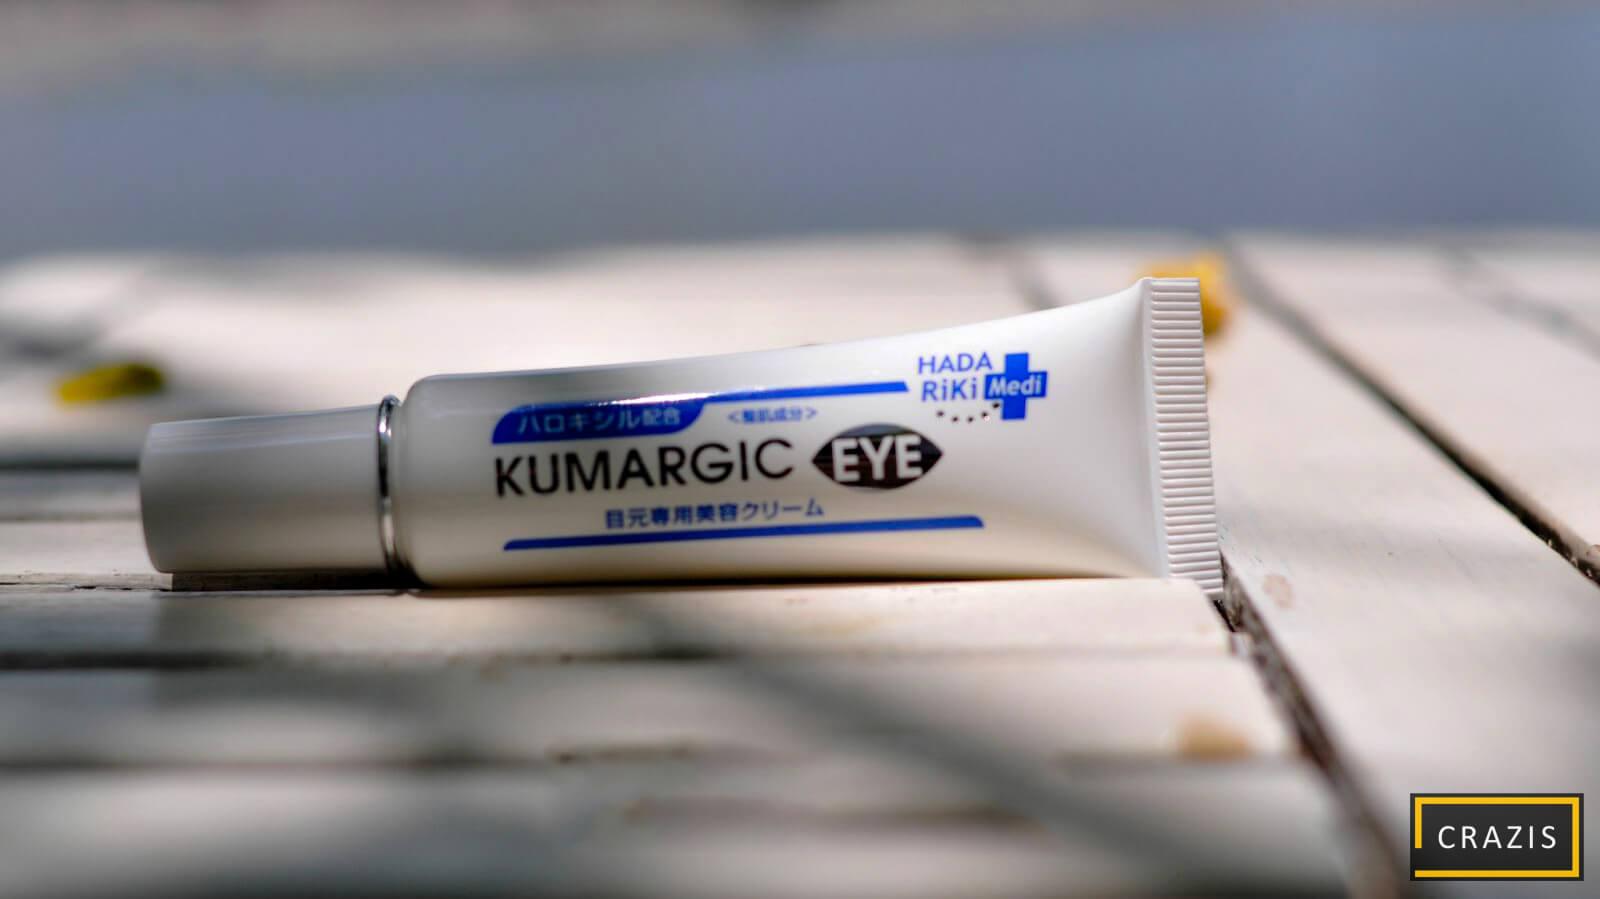 Kem dưỡng mắt Kurmagic